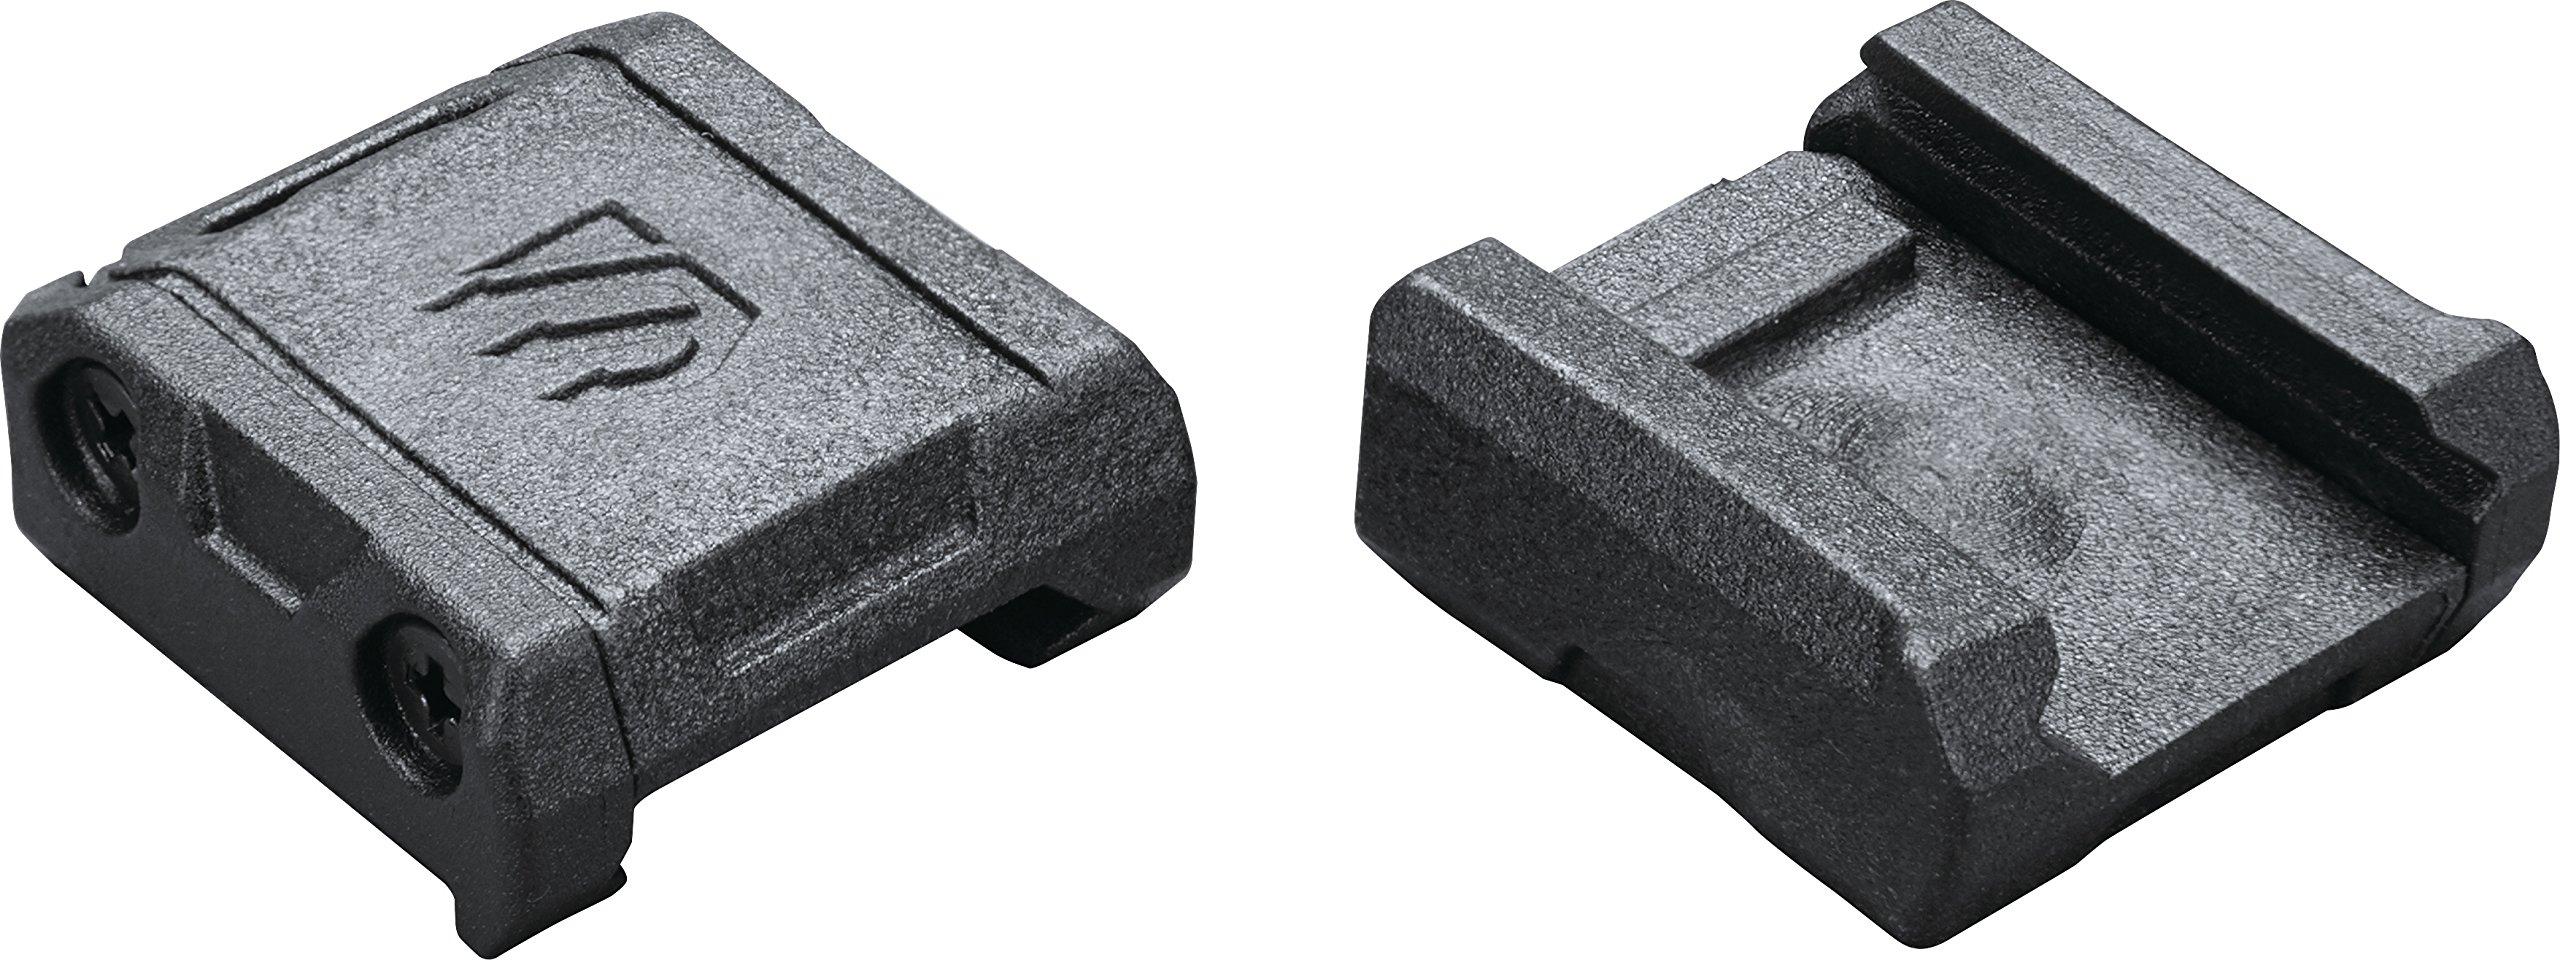 BLACKHAWK! Omnivore Rail Attachment Device Pistol Case, Black, One Size by BLACKHAWK! (Image #1)